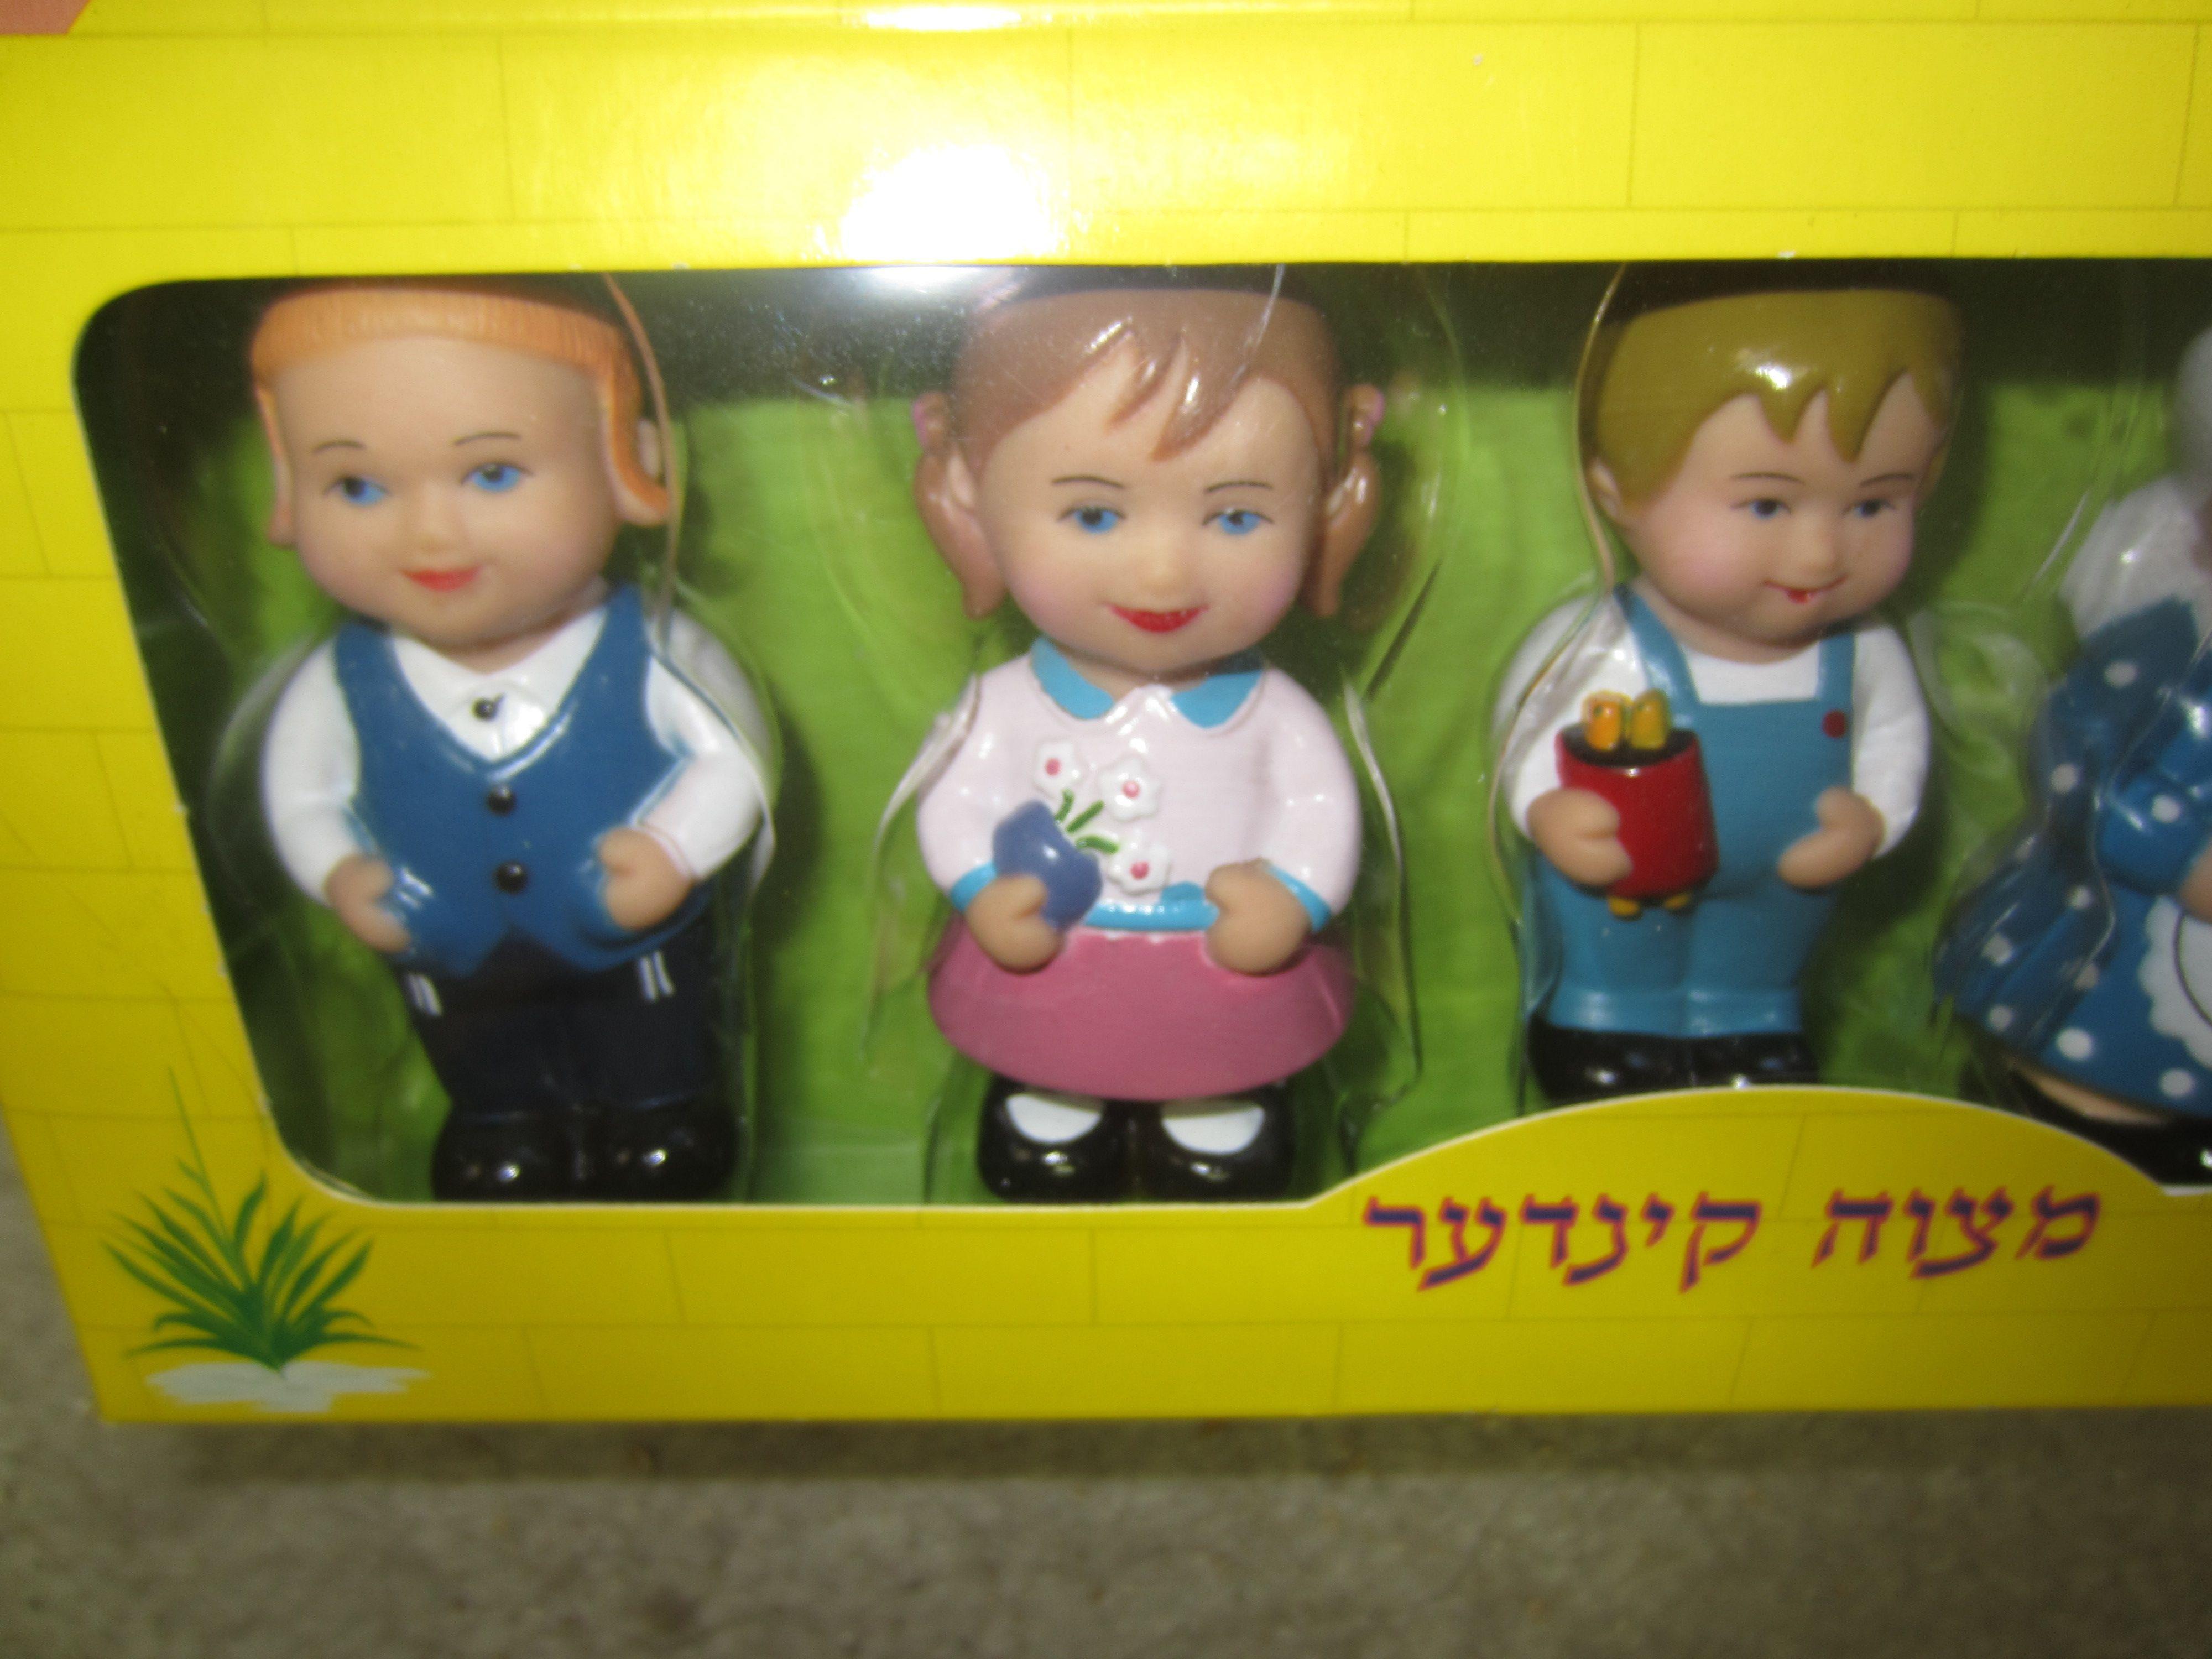 Mitzvah Kinder Set Of Orthodox Jewish Family Dolls Toys In